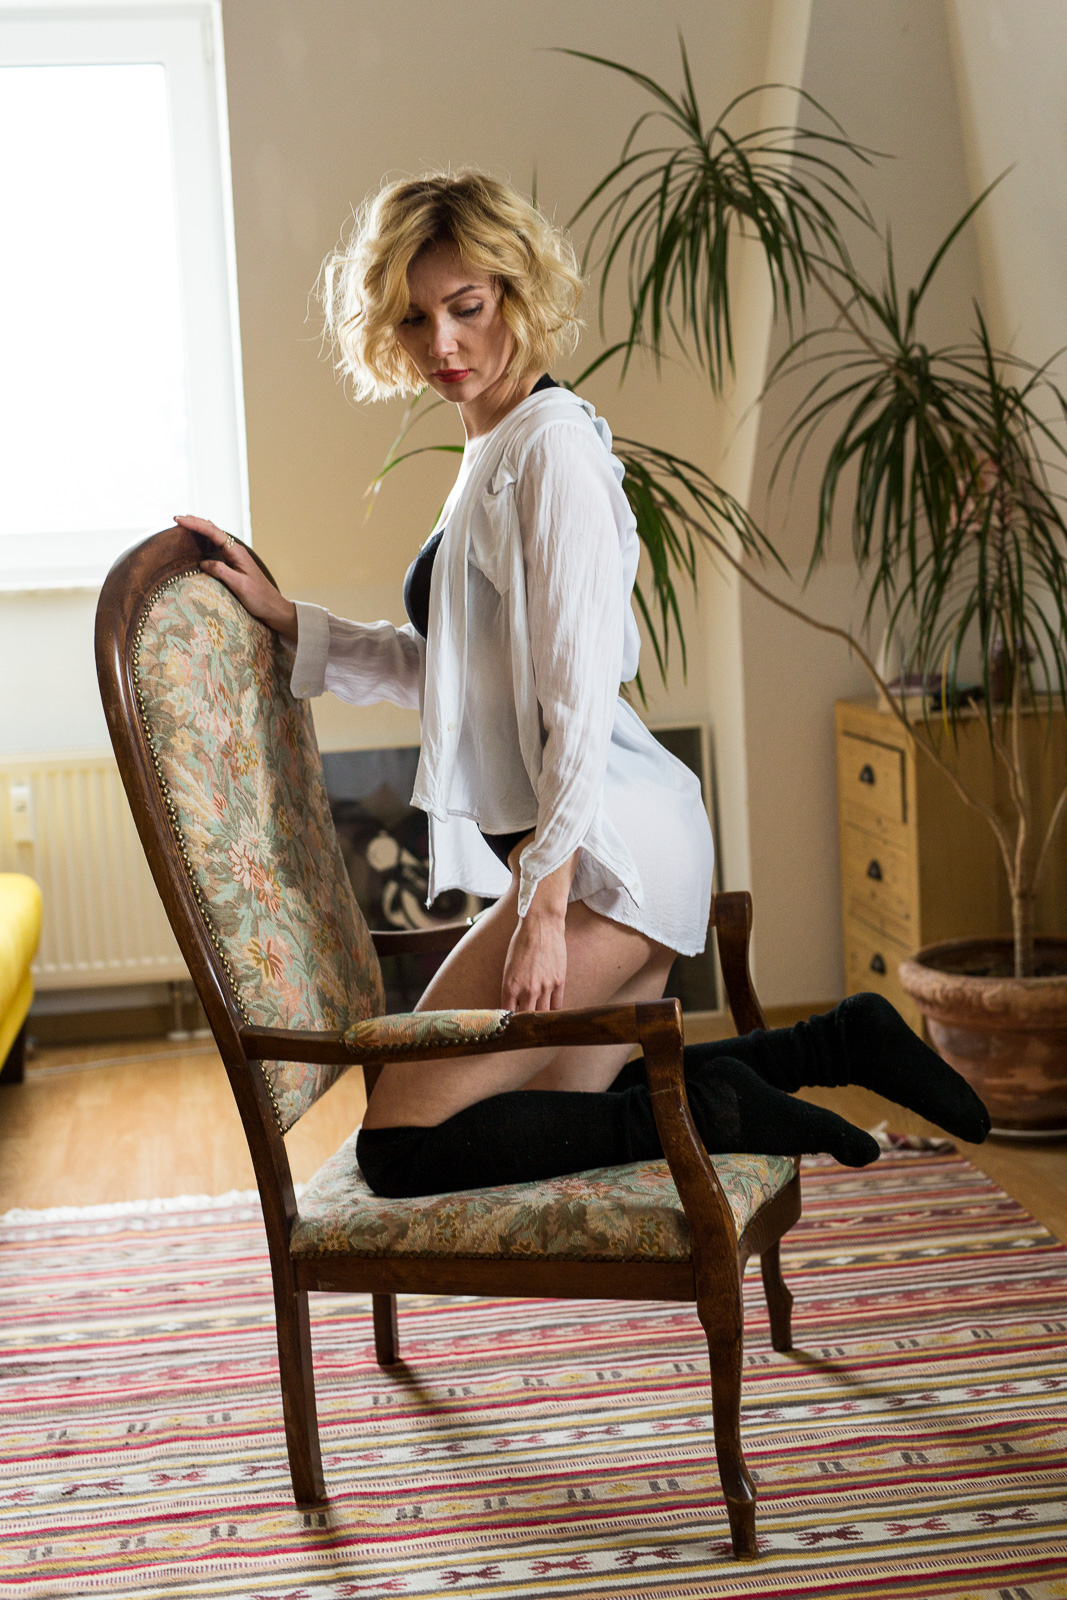 Boudoir-Foto von Maria im Sessel